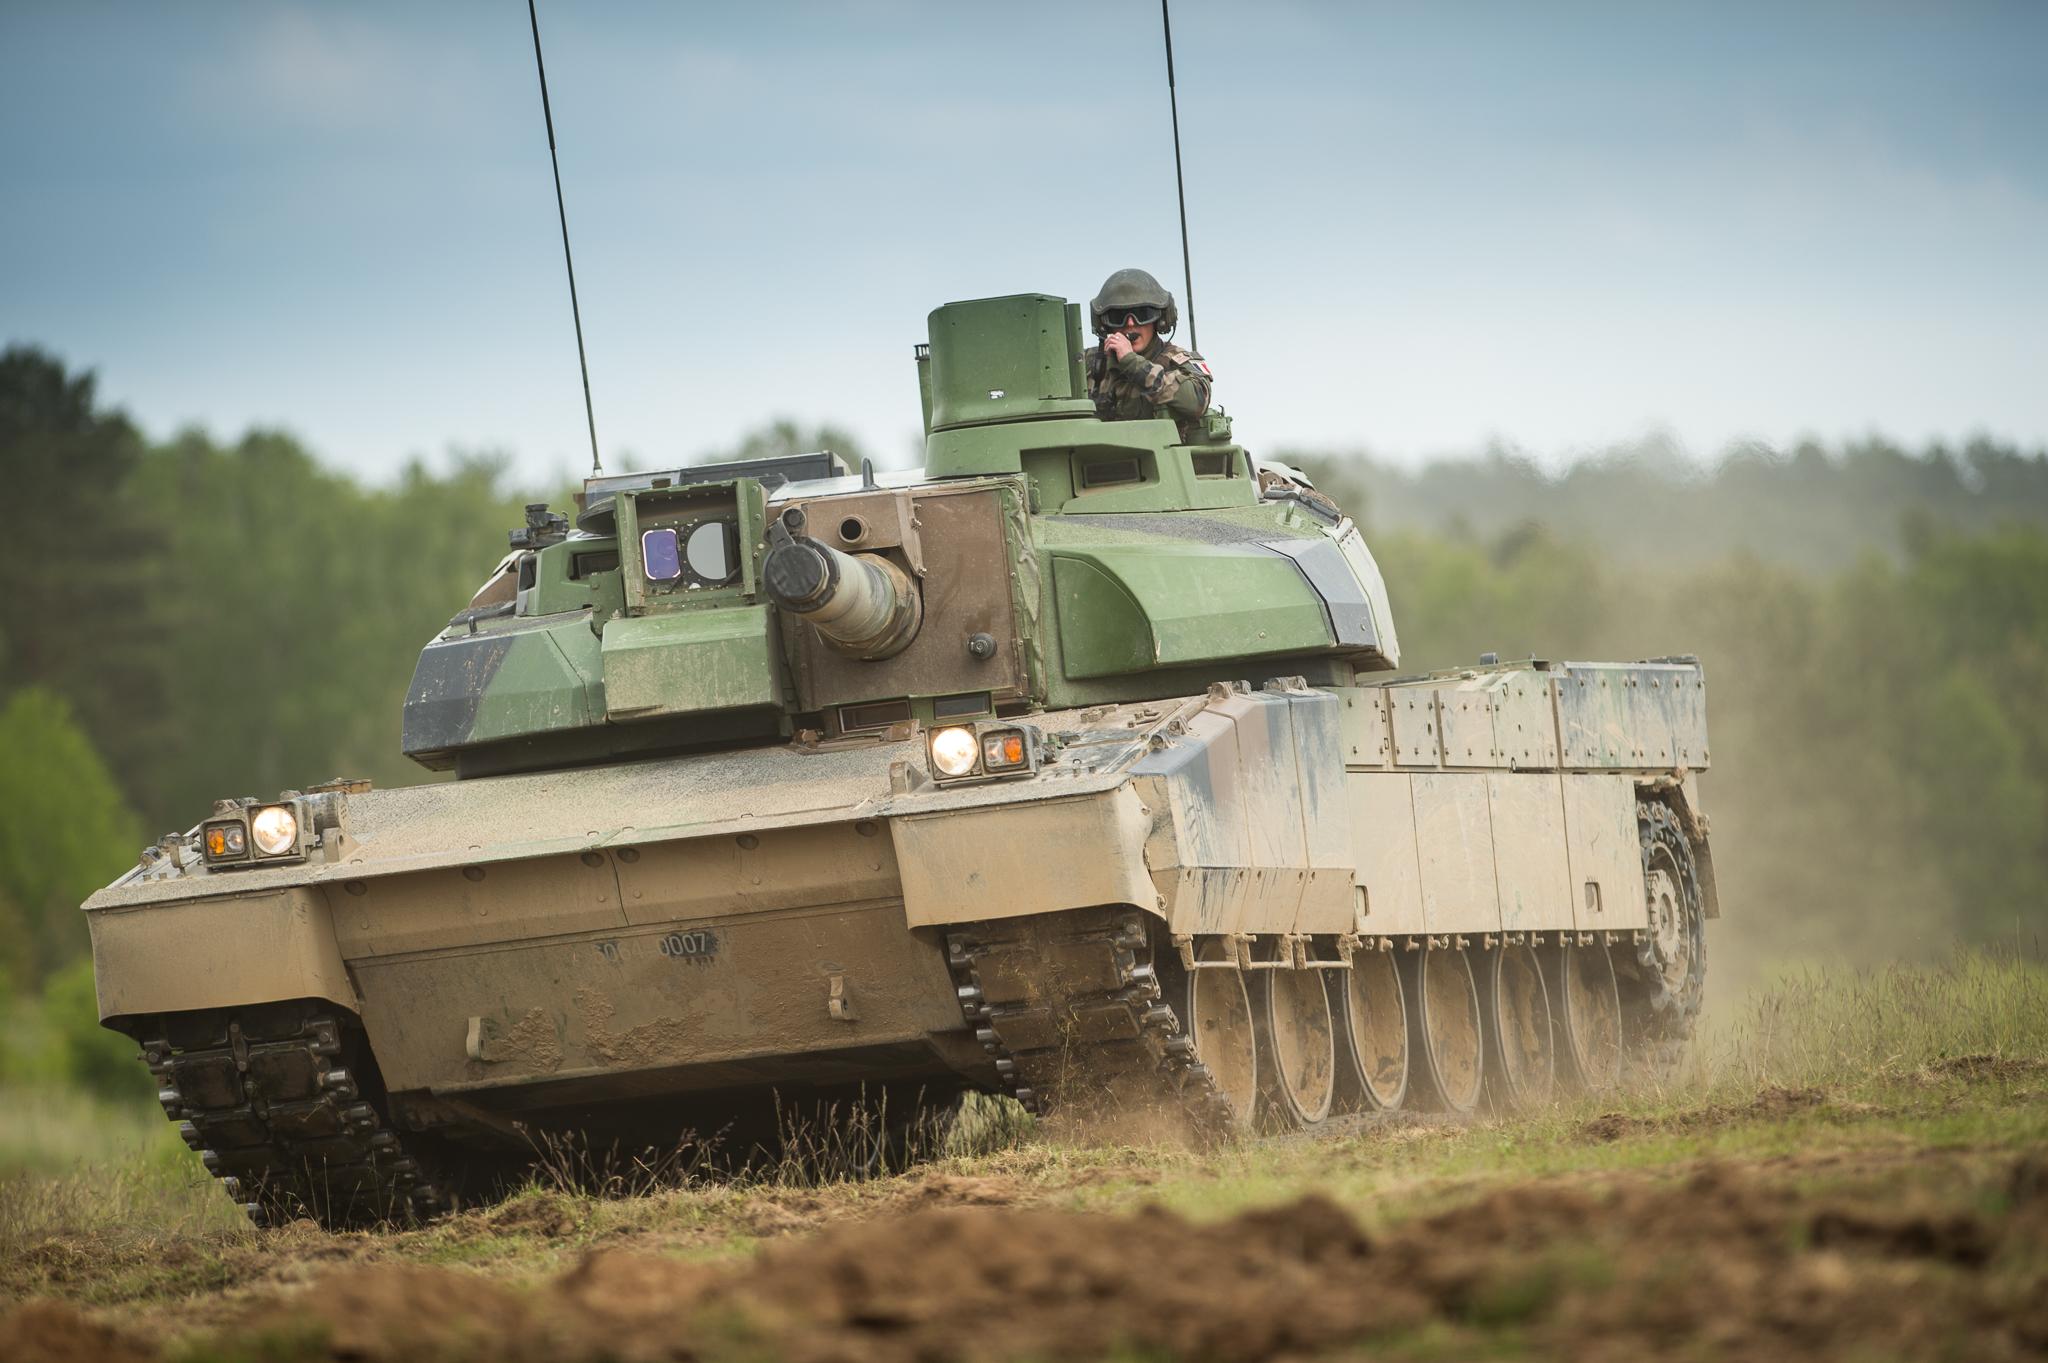 French Army AMX-56 Leclerc